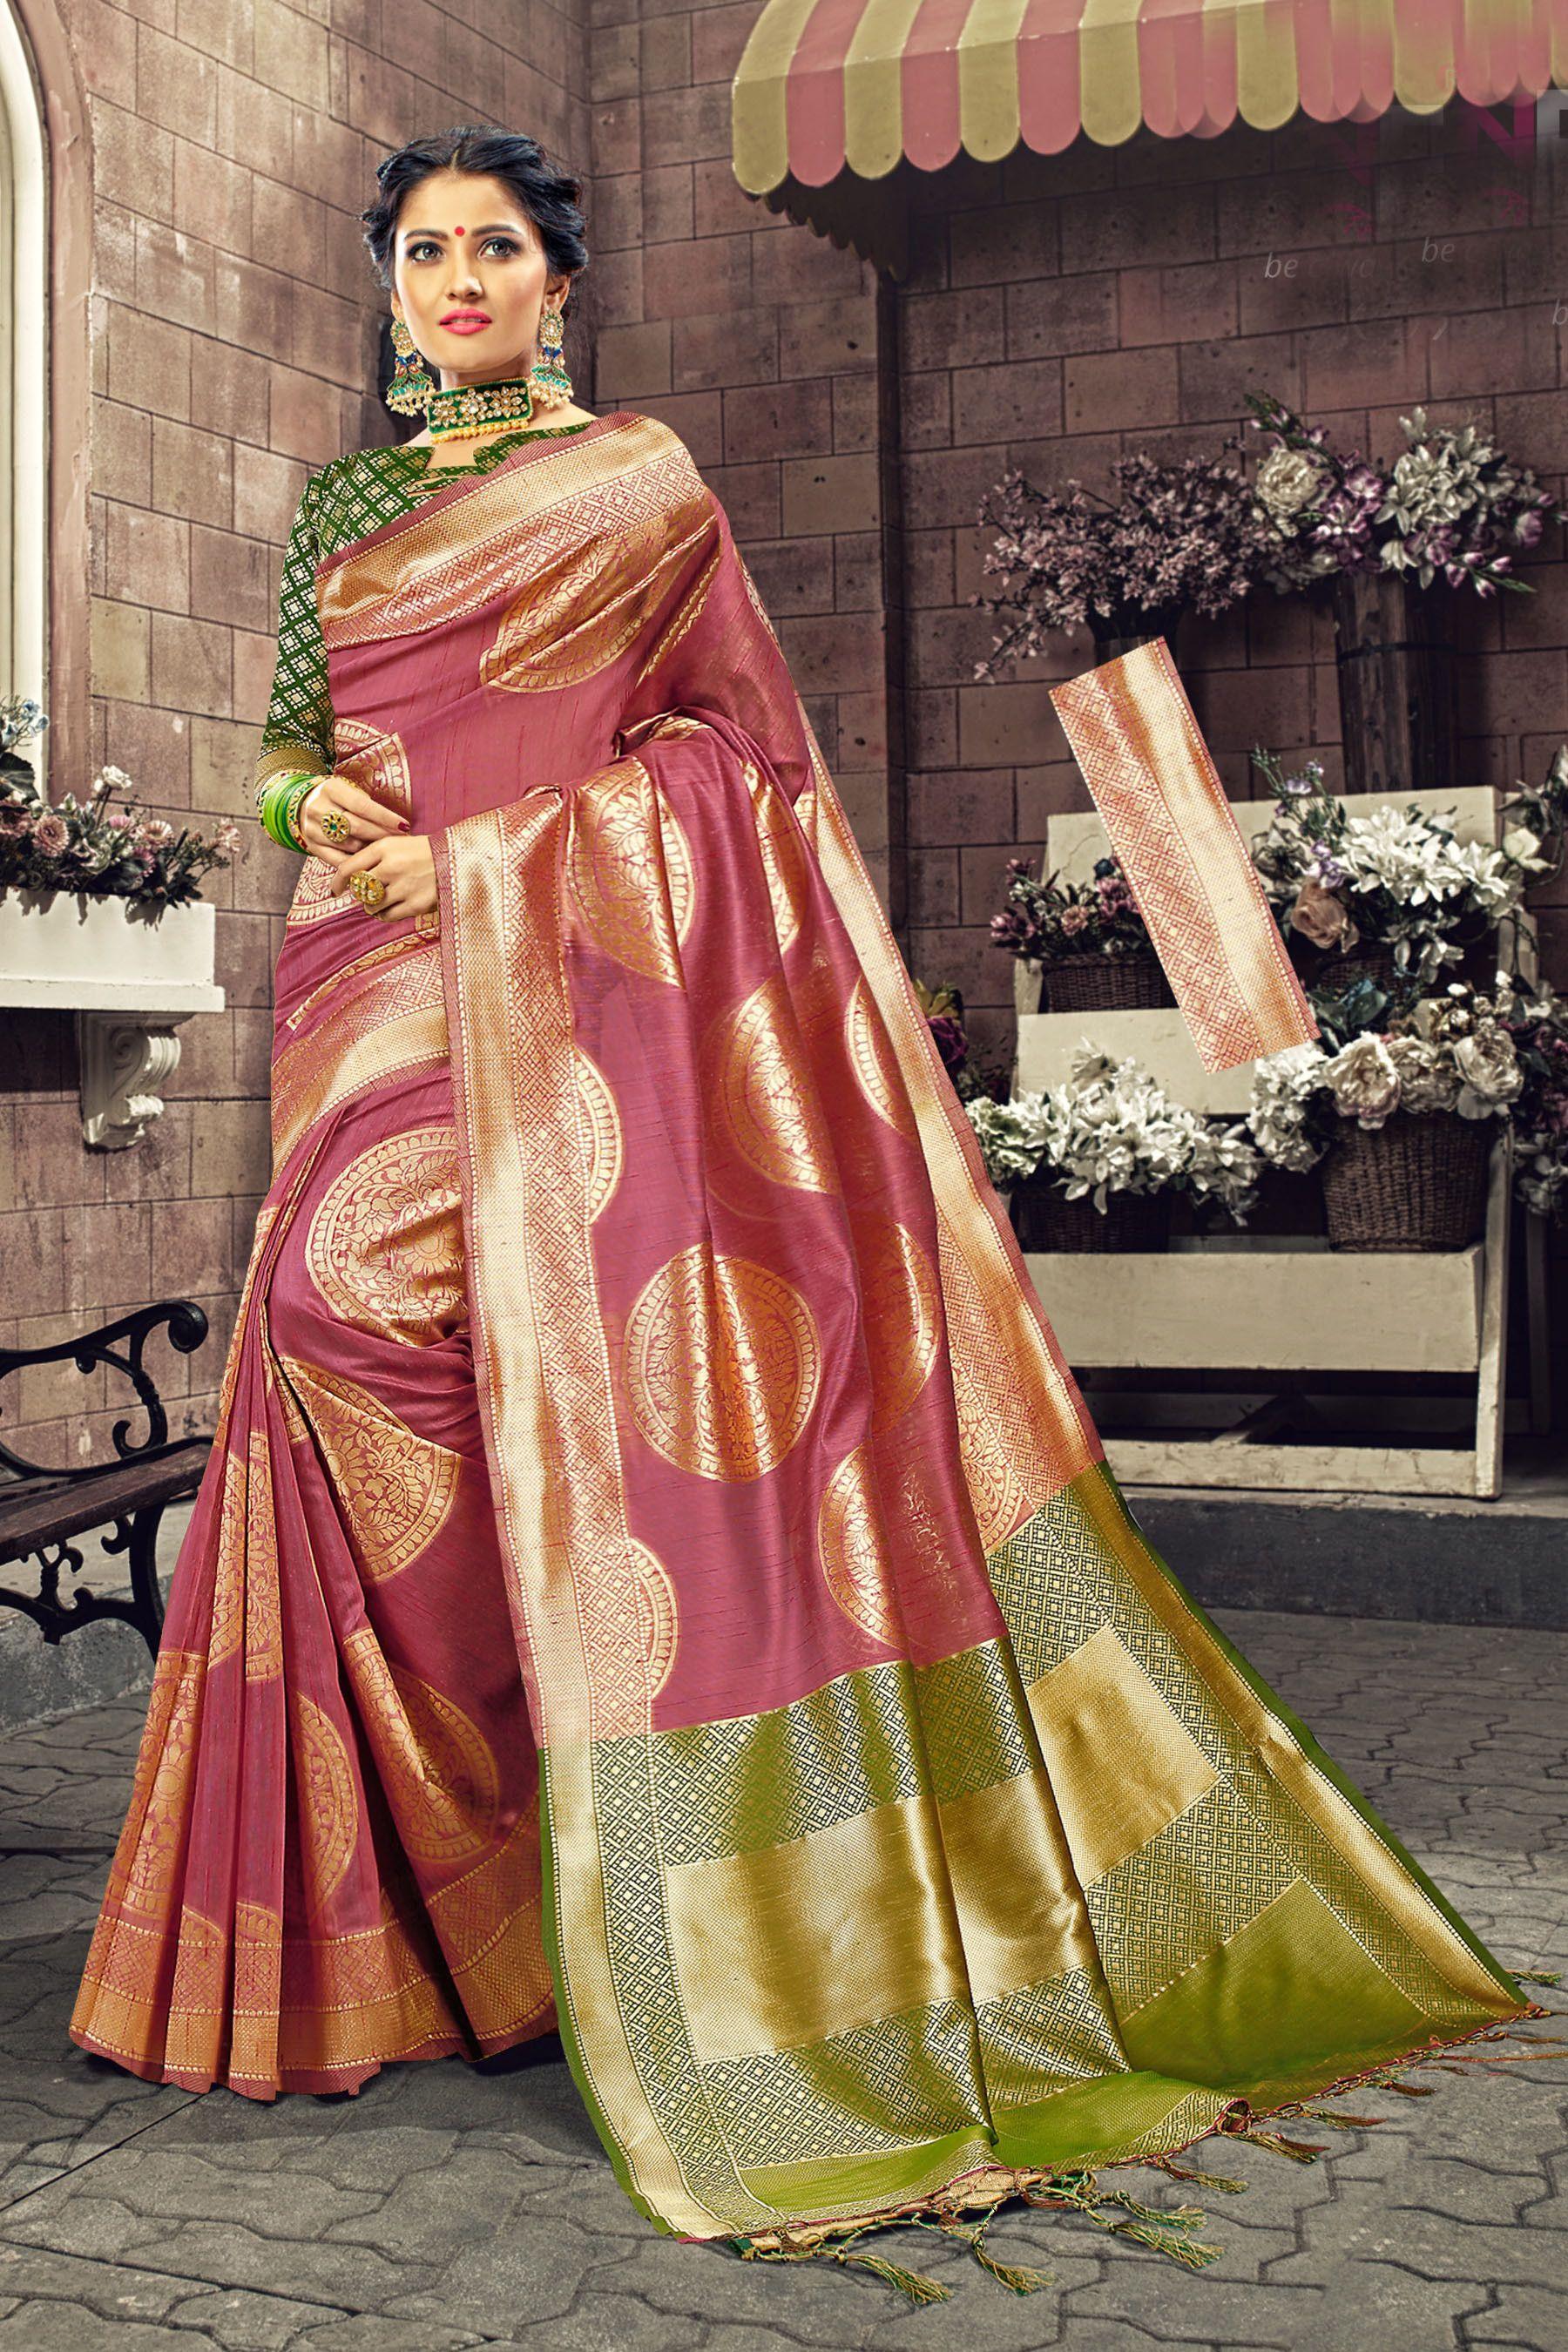 c2889f929ac843 #saree, #Wedding, #Hot, #Blouse, #Pattu, #Draping, #Farewell, #Photoshoot,  #Cotton, #Modern, #Dress, #Georgette, #Styles, #Sabyasachi, #Floral, #Lace,  ...